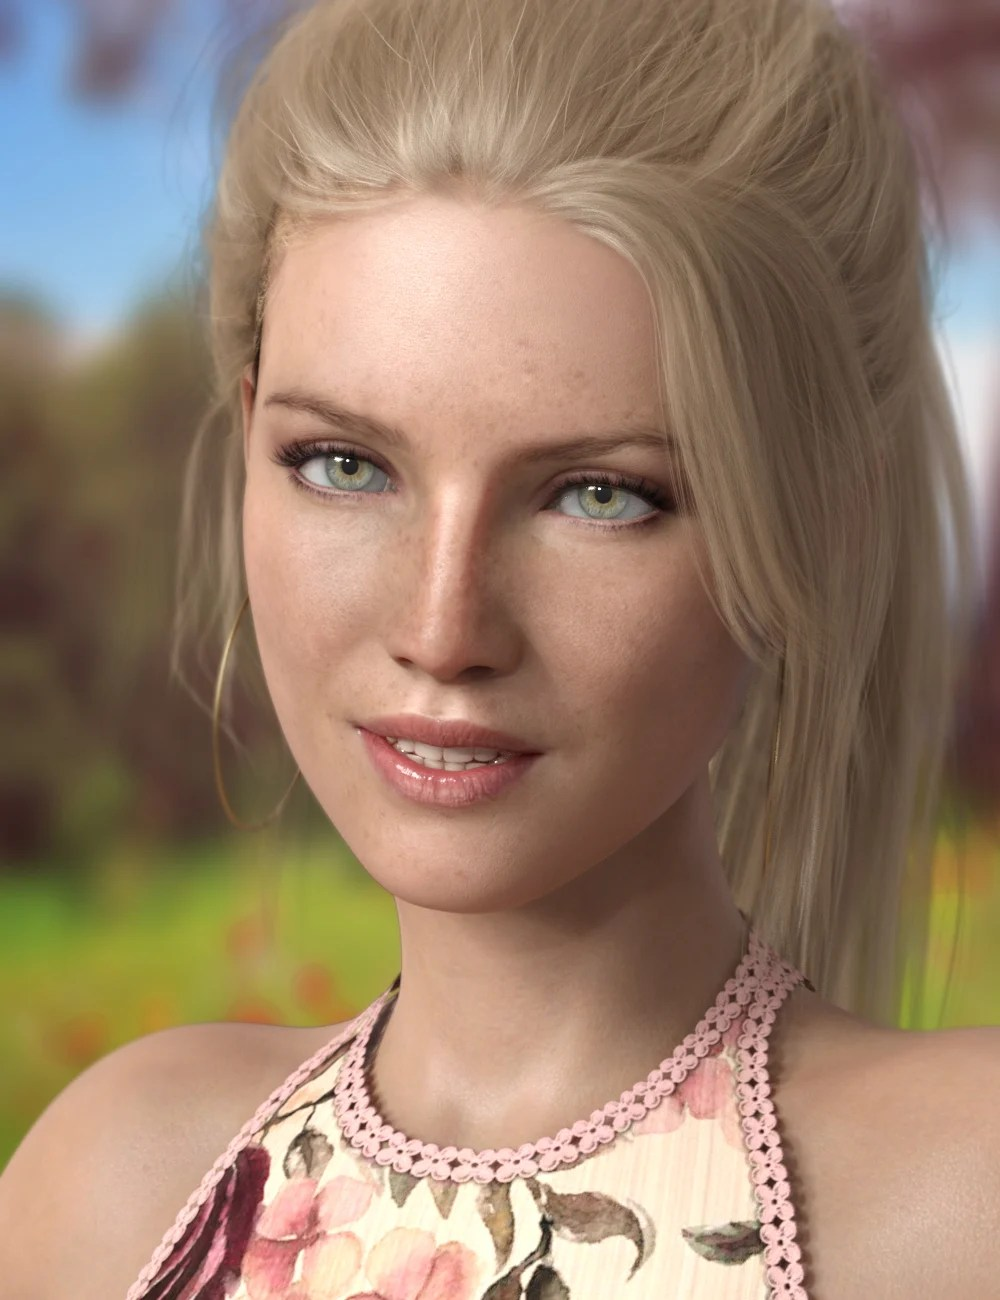 P3D Sigrid HD for Genesis 8 Female by: P3Design, 3D Models by Daz 3D